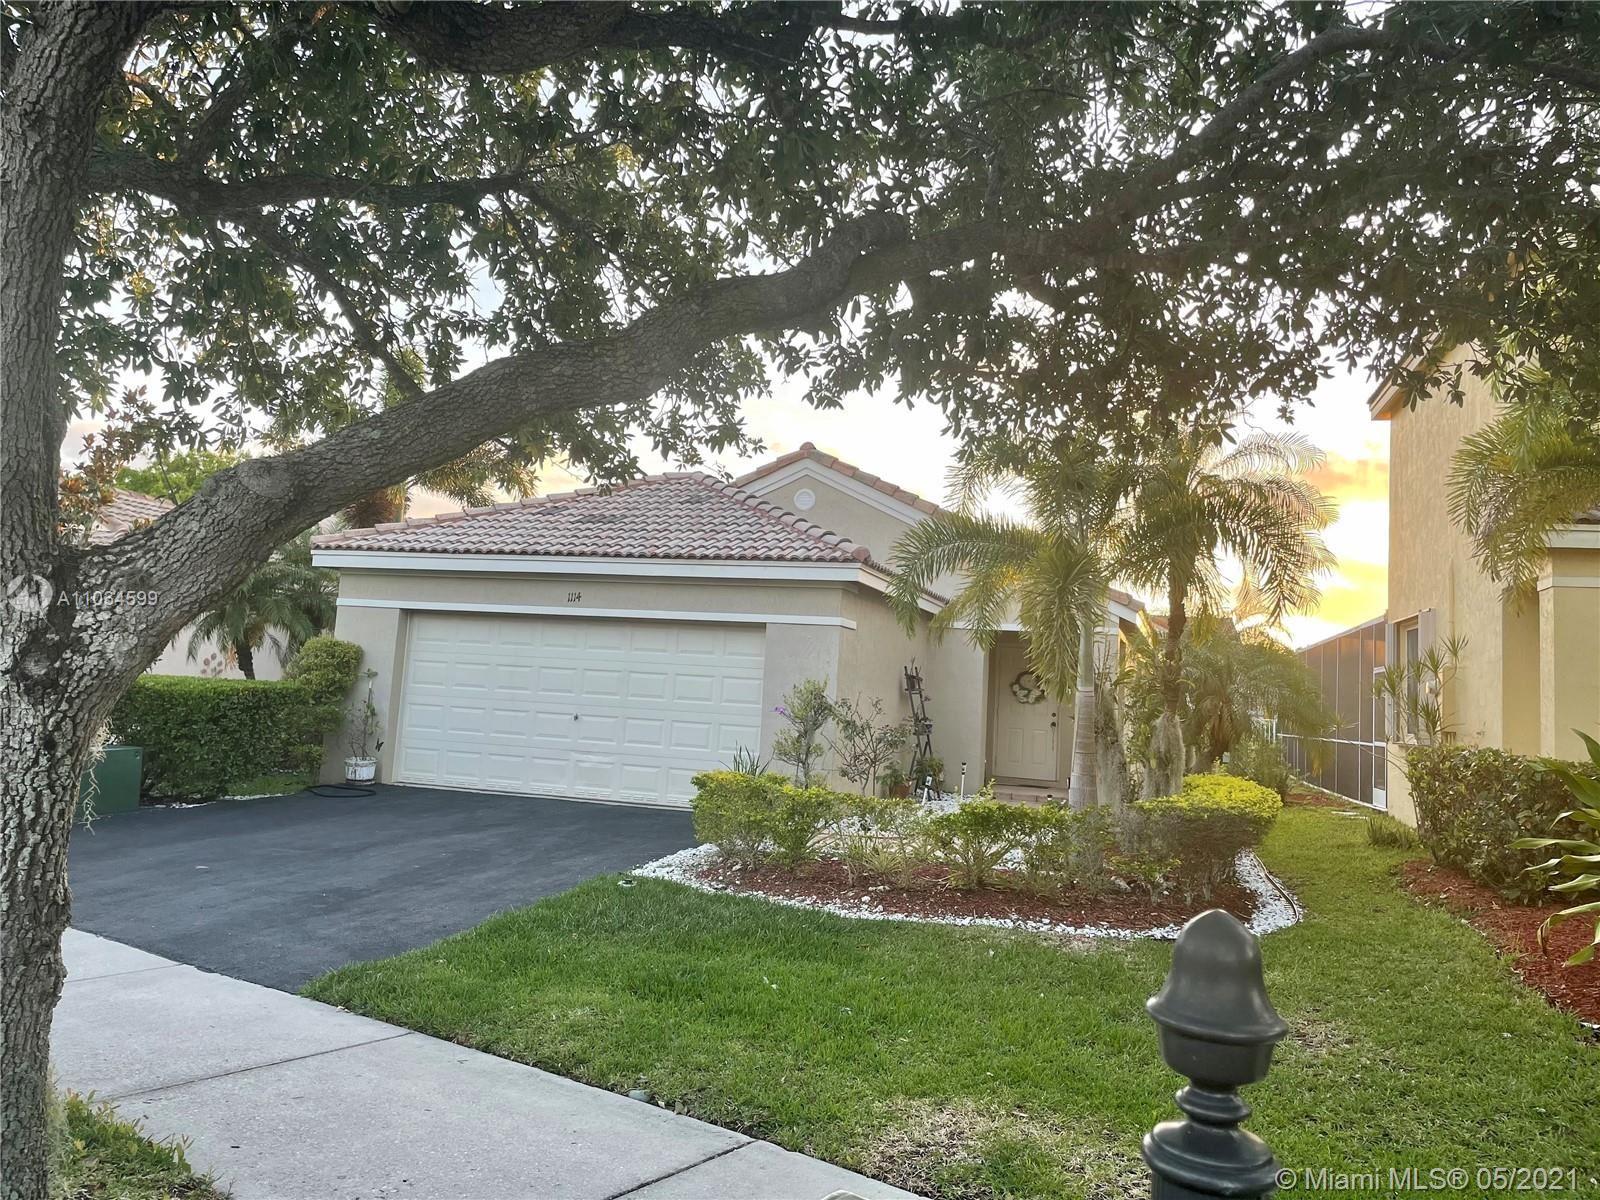 1114 Alexander Bnd, Weston, FL 33327 - #: A11034599